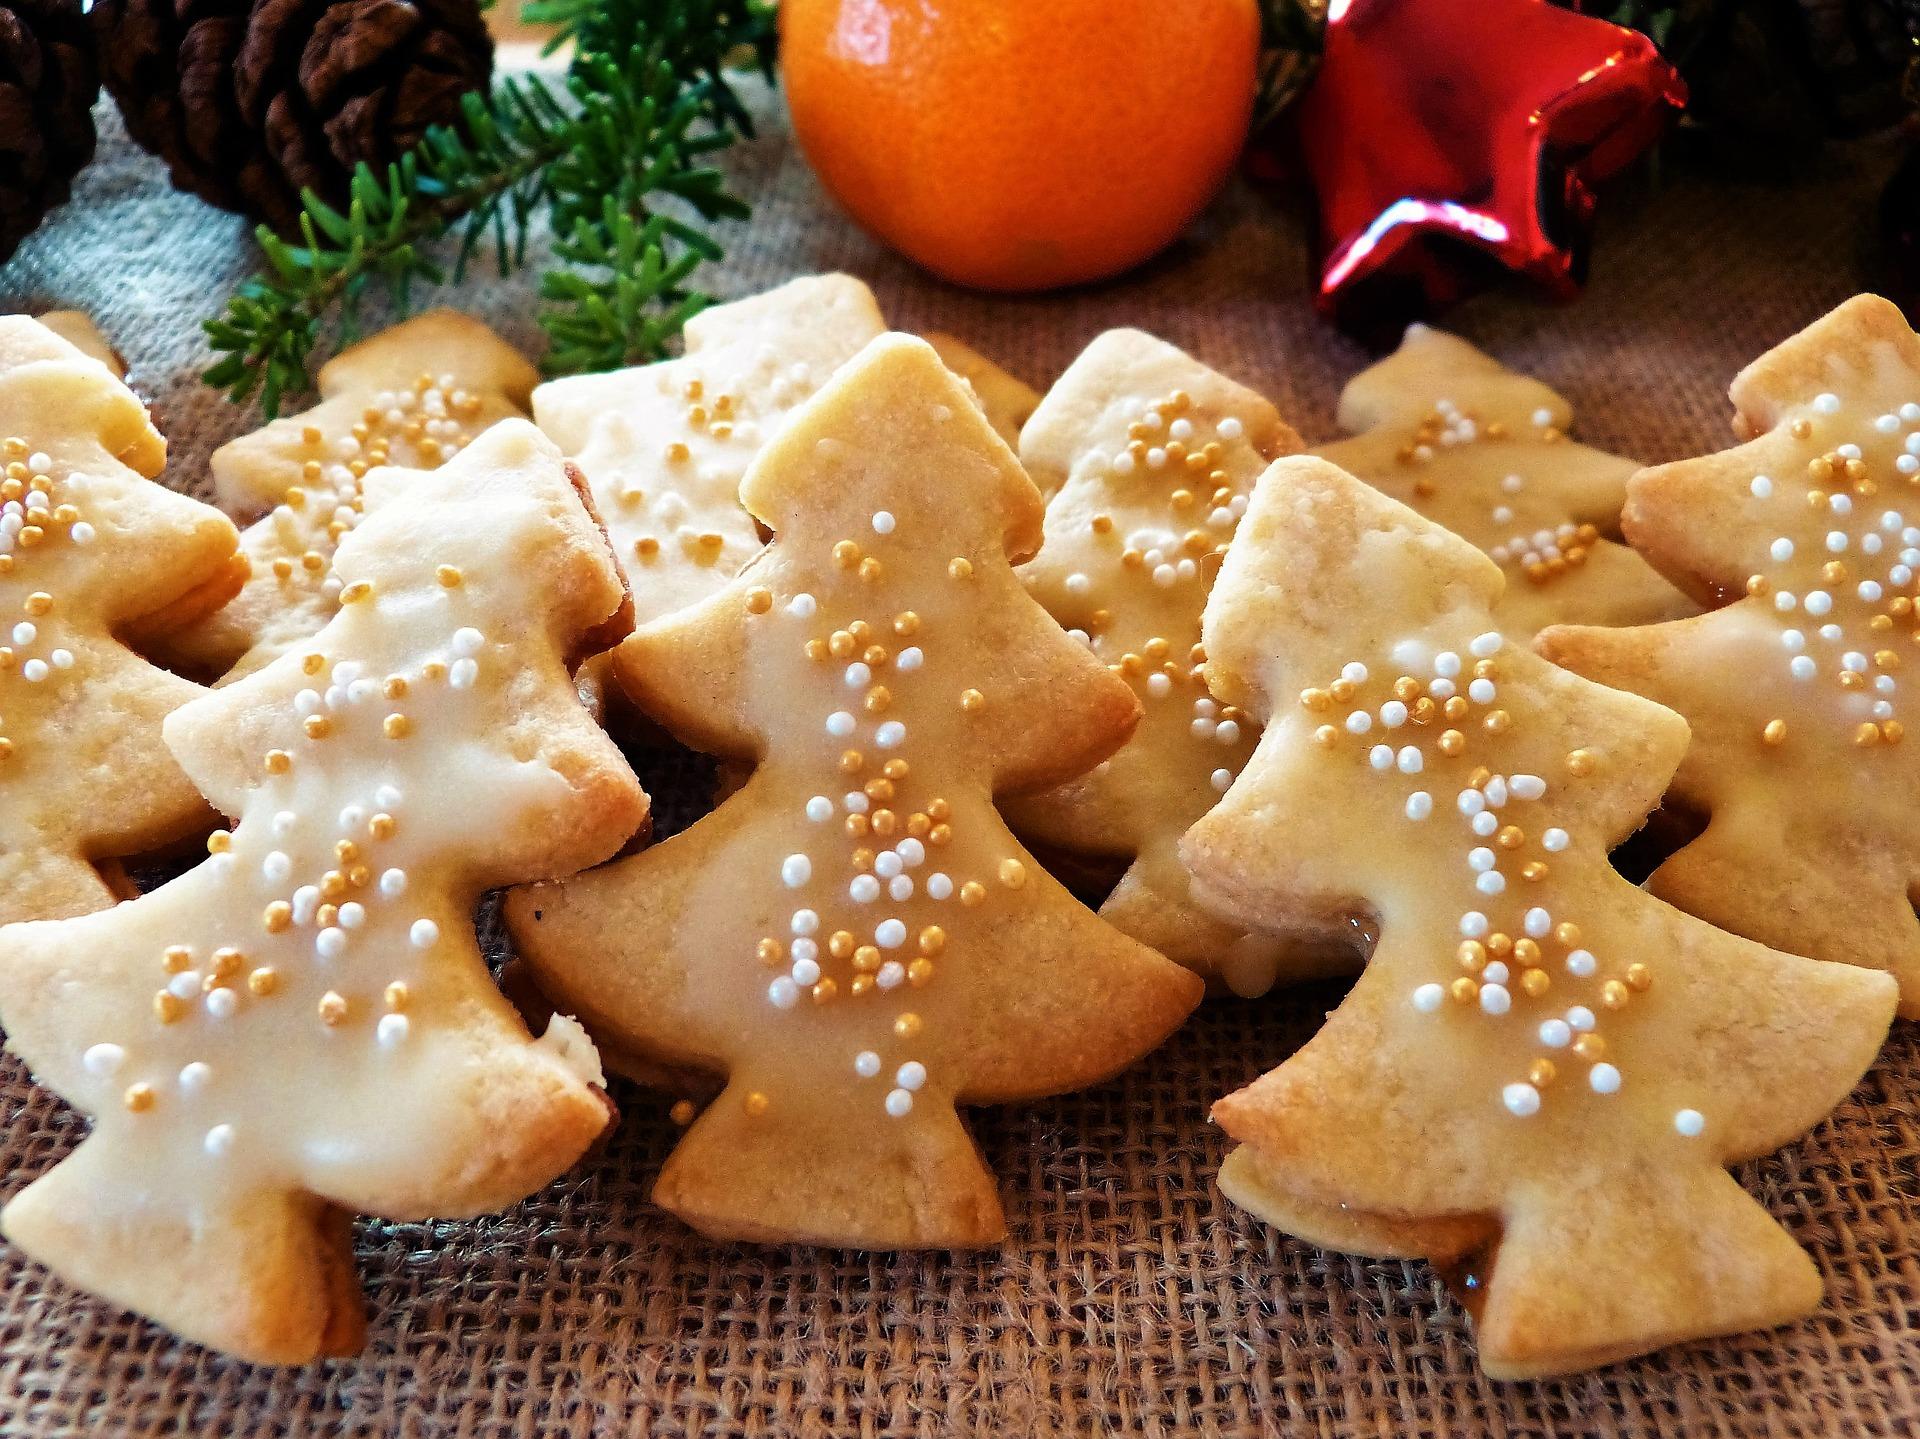 butterweihnachtsplatzchenpixabay